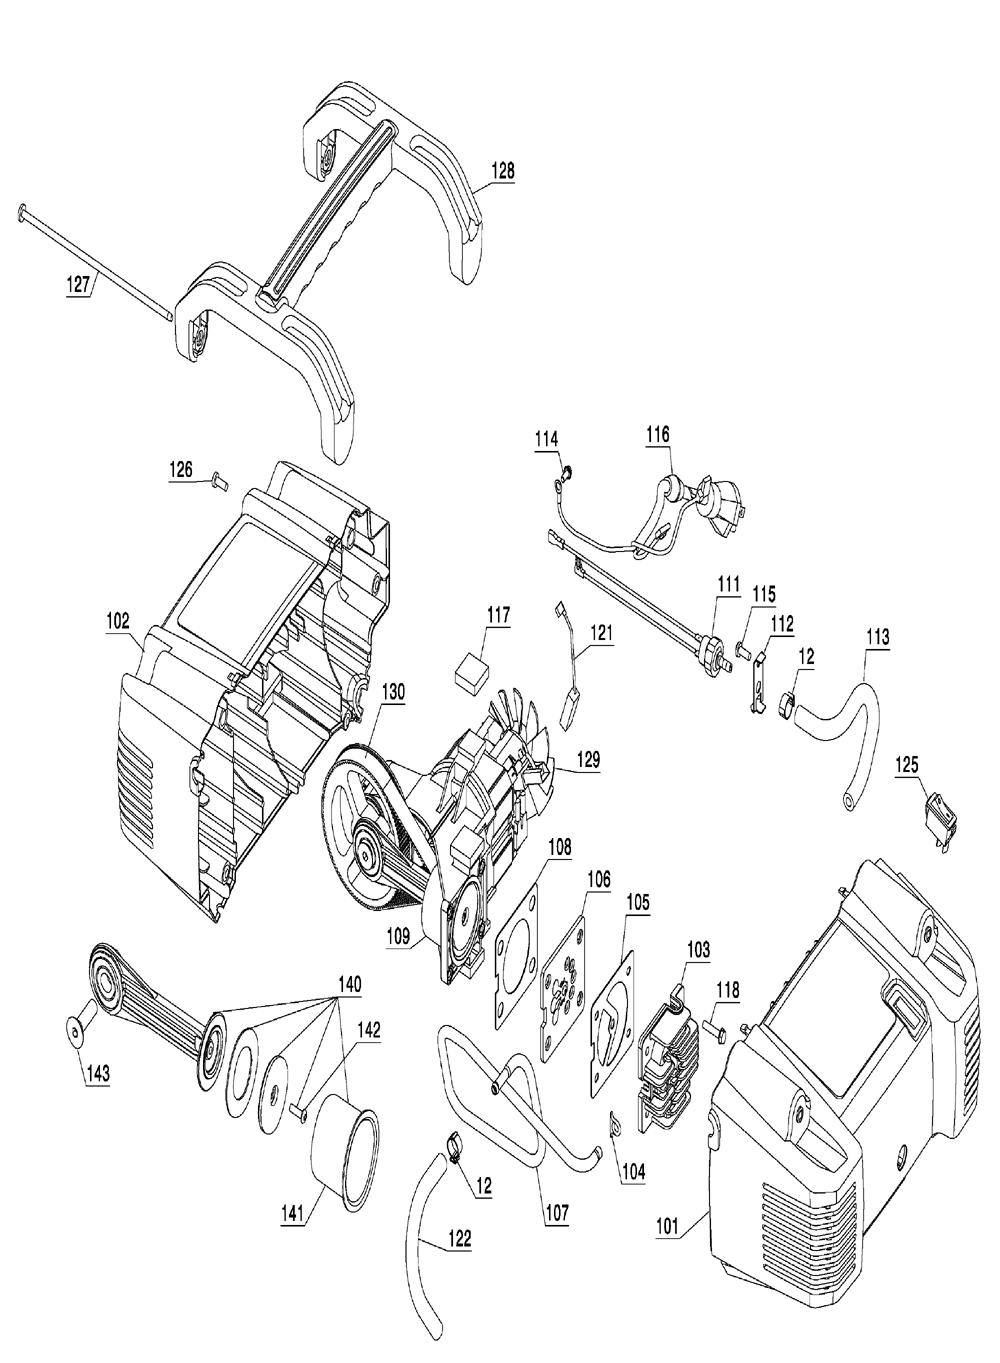 C2002-portercable-T5-PB-1Break Down